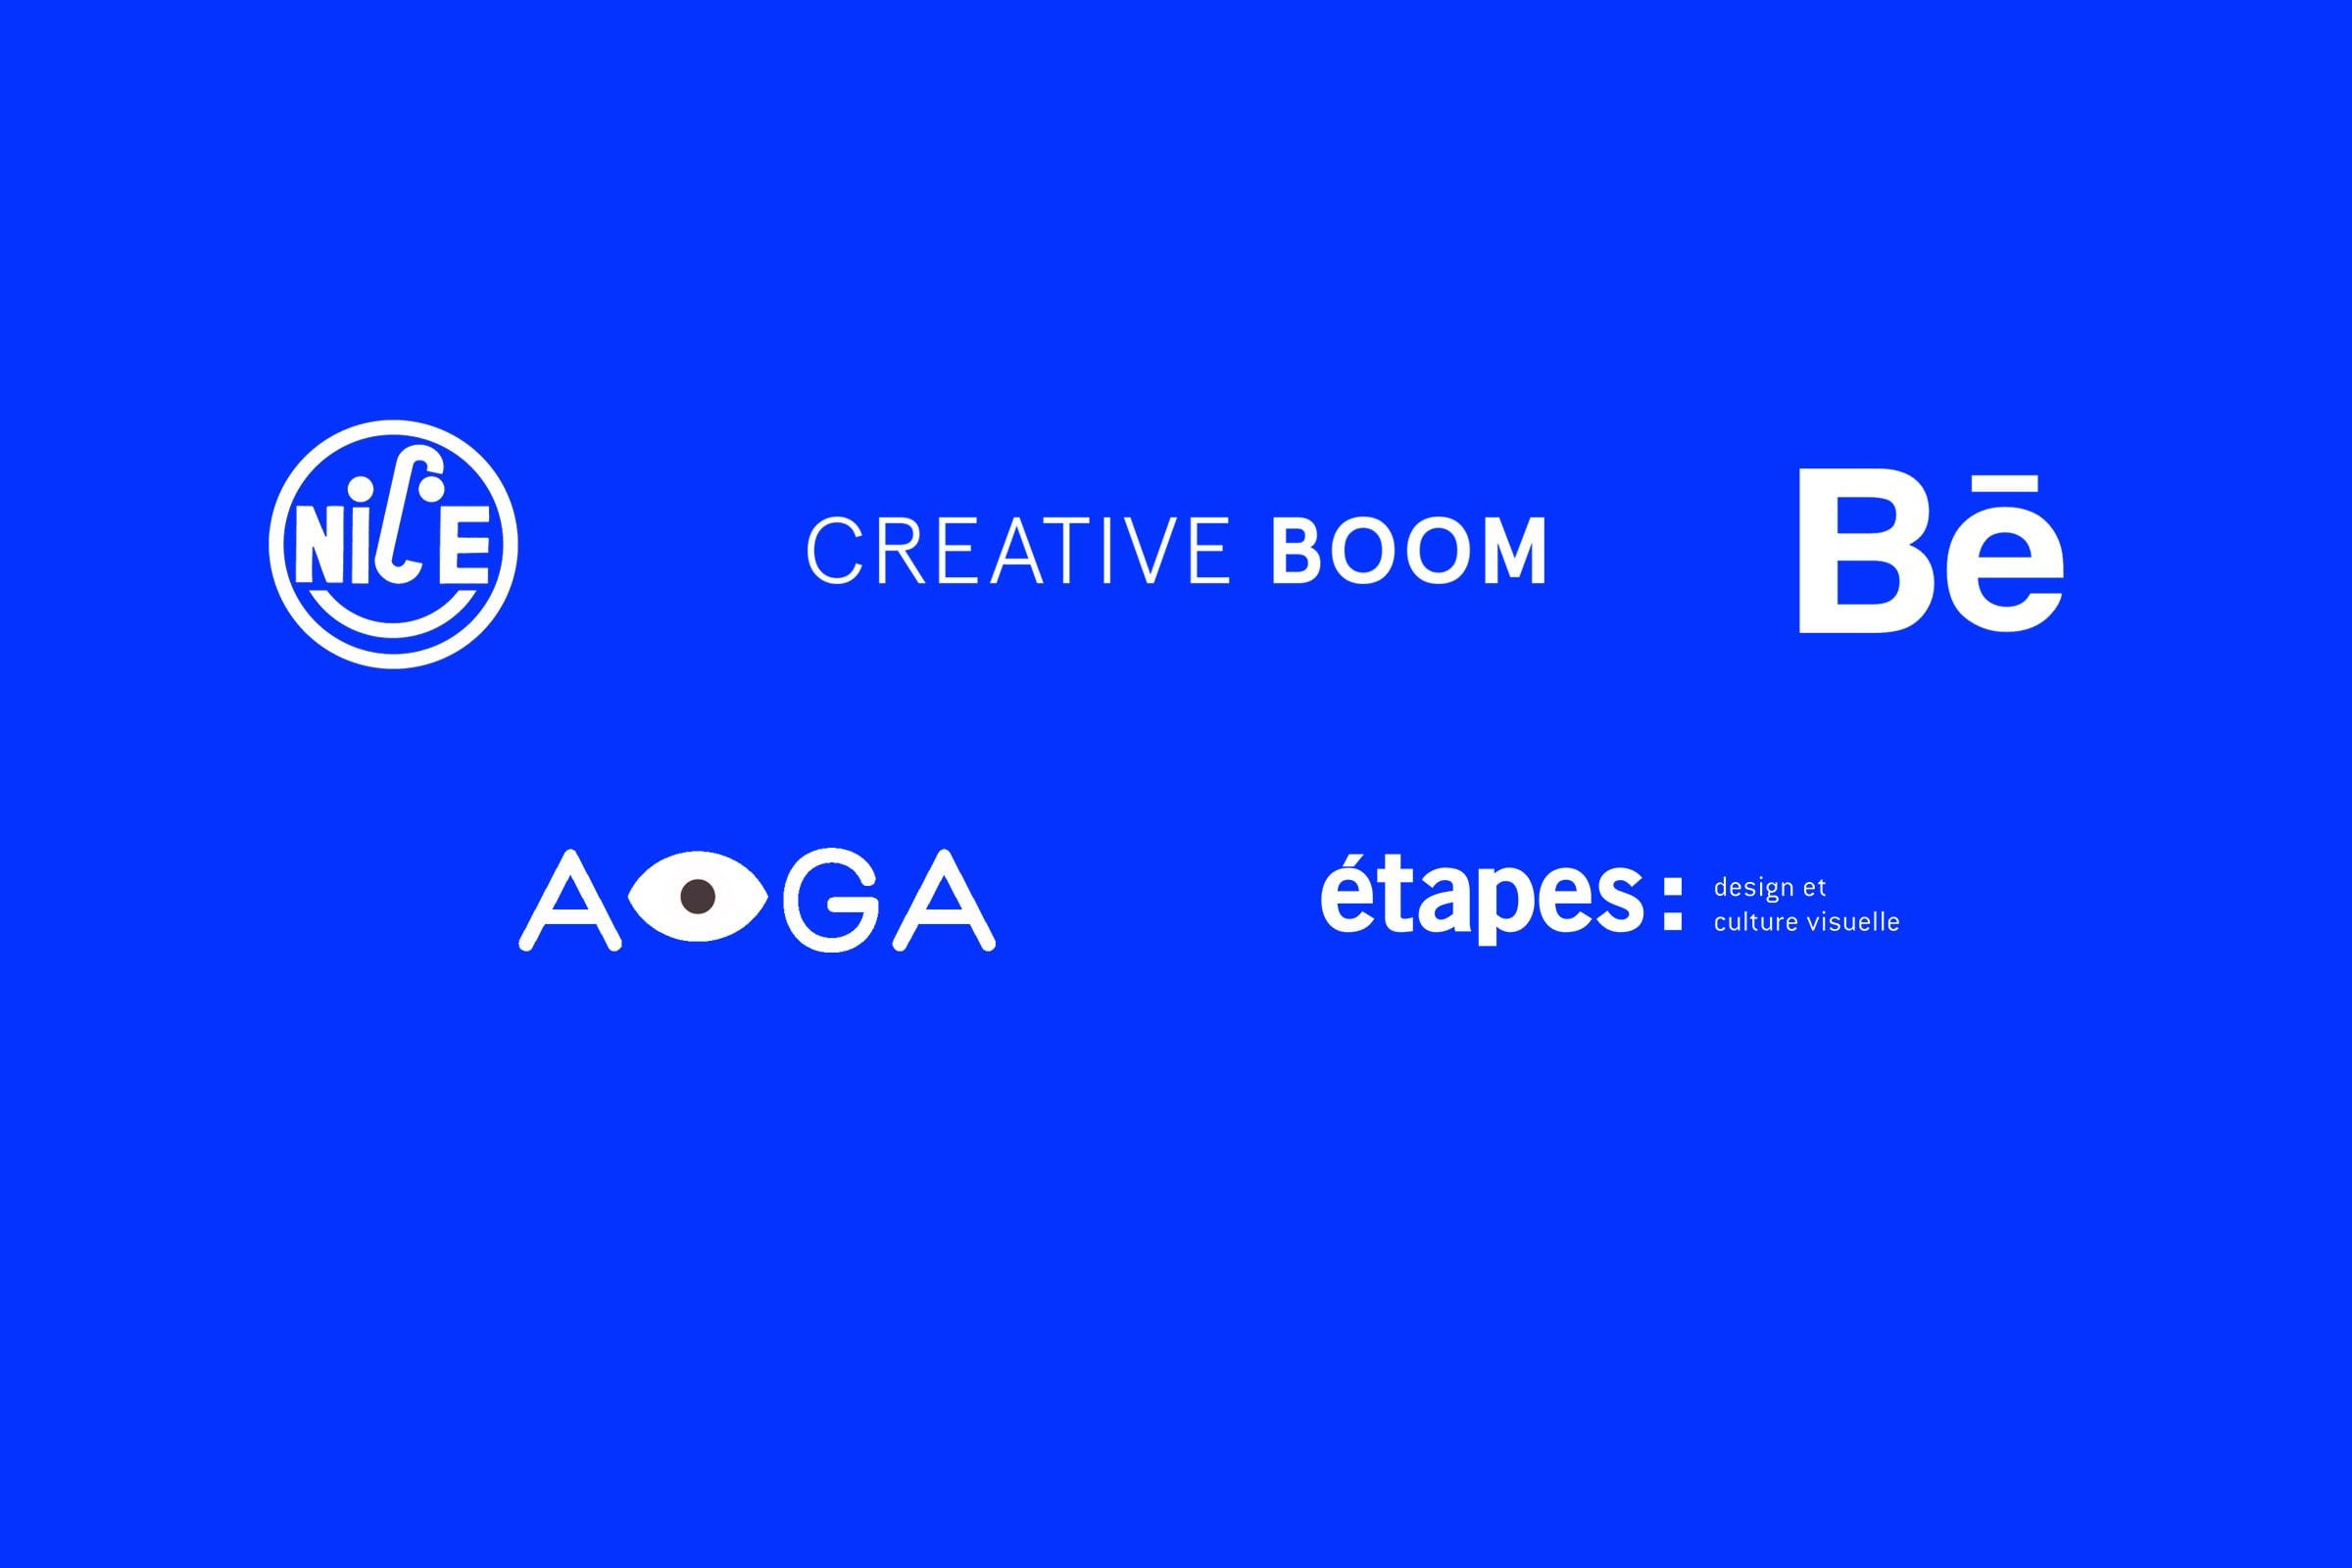 Aiga, etapes, Design, Blog, Press, It's nice that, Creative Boom, Behance, Badge